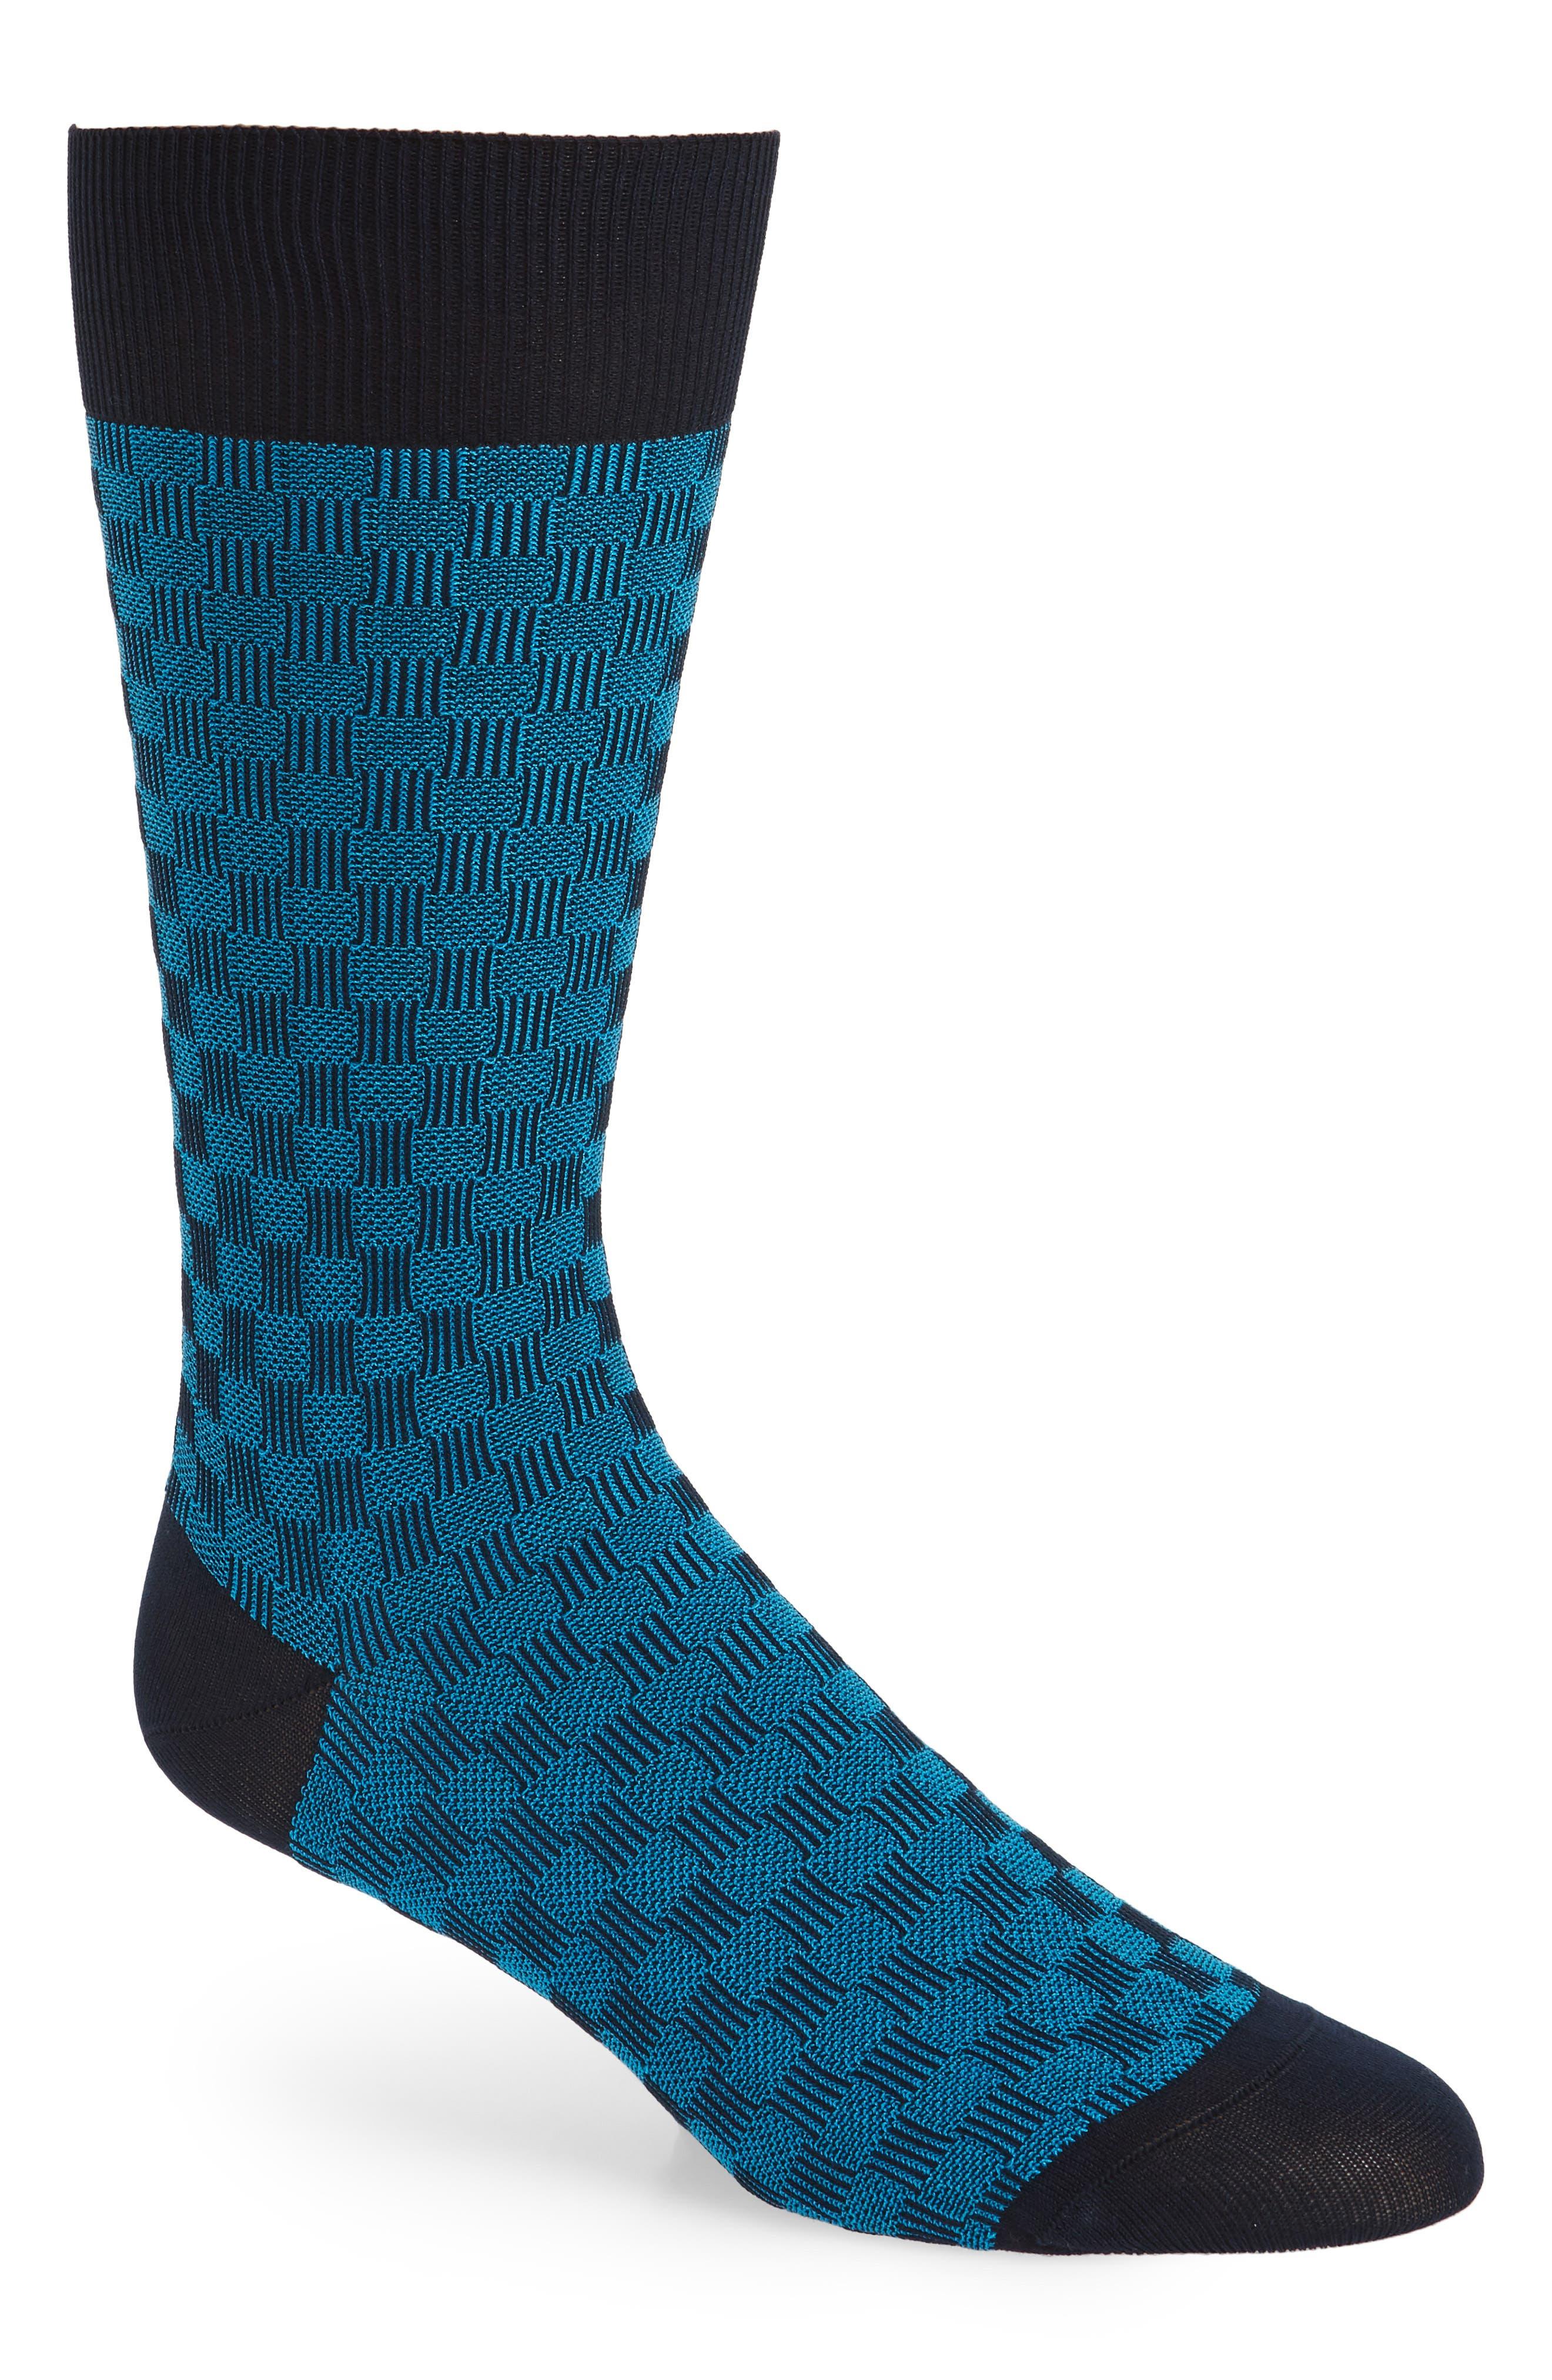 Patchwork Socks,                             Main thumbnail 1, color,                             Navy